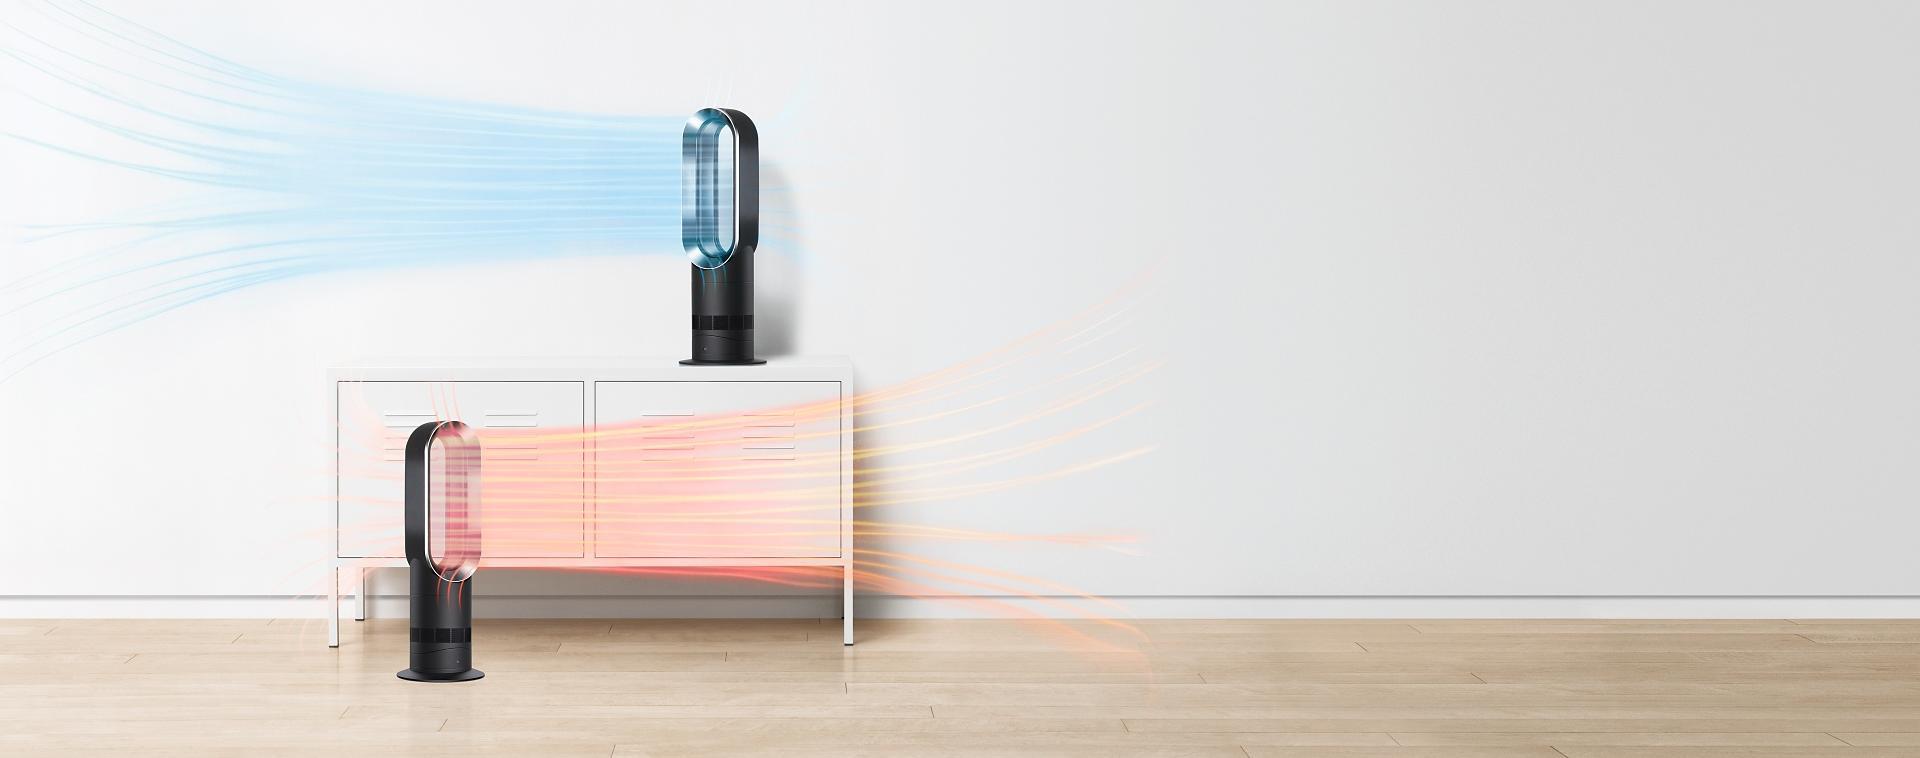 Dyson Hot+Cool fan heater desktop and tower